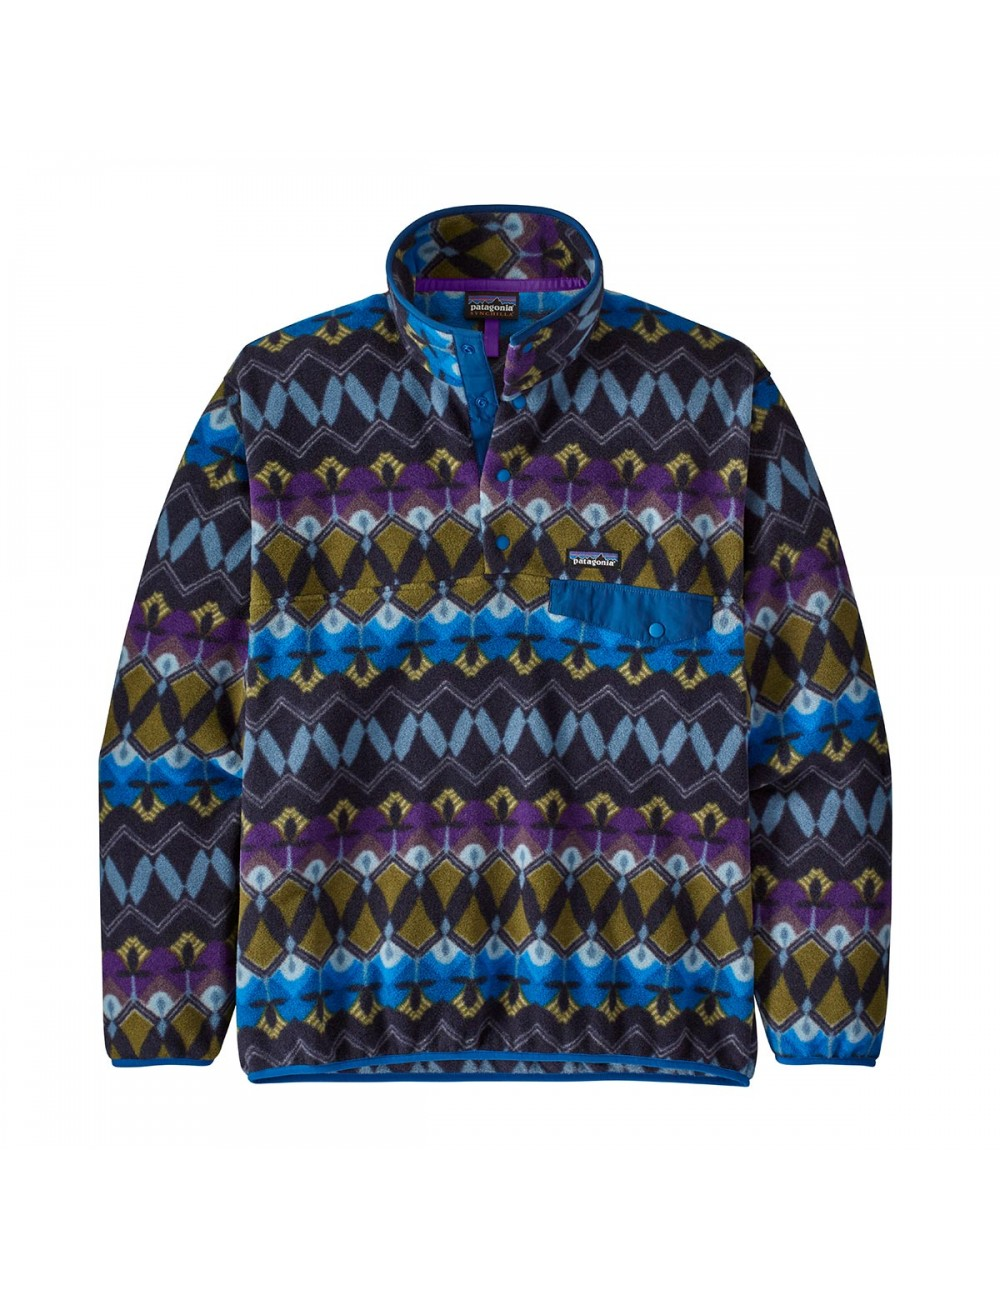 Patagonia Lightweight Synchilla Snap-T Fleece Pullover - Navy_13296